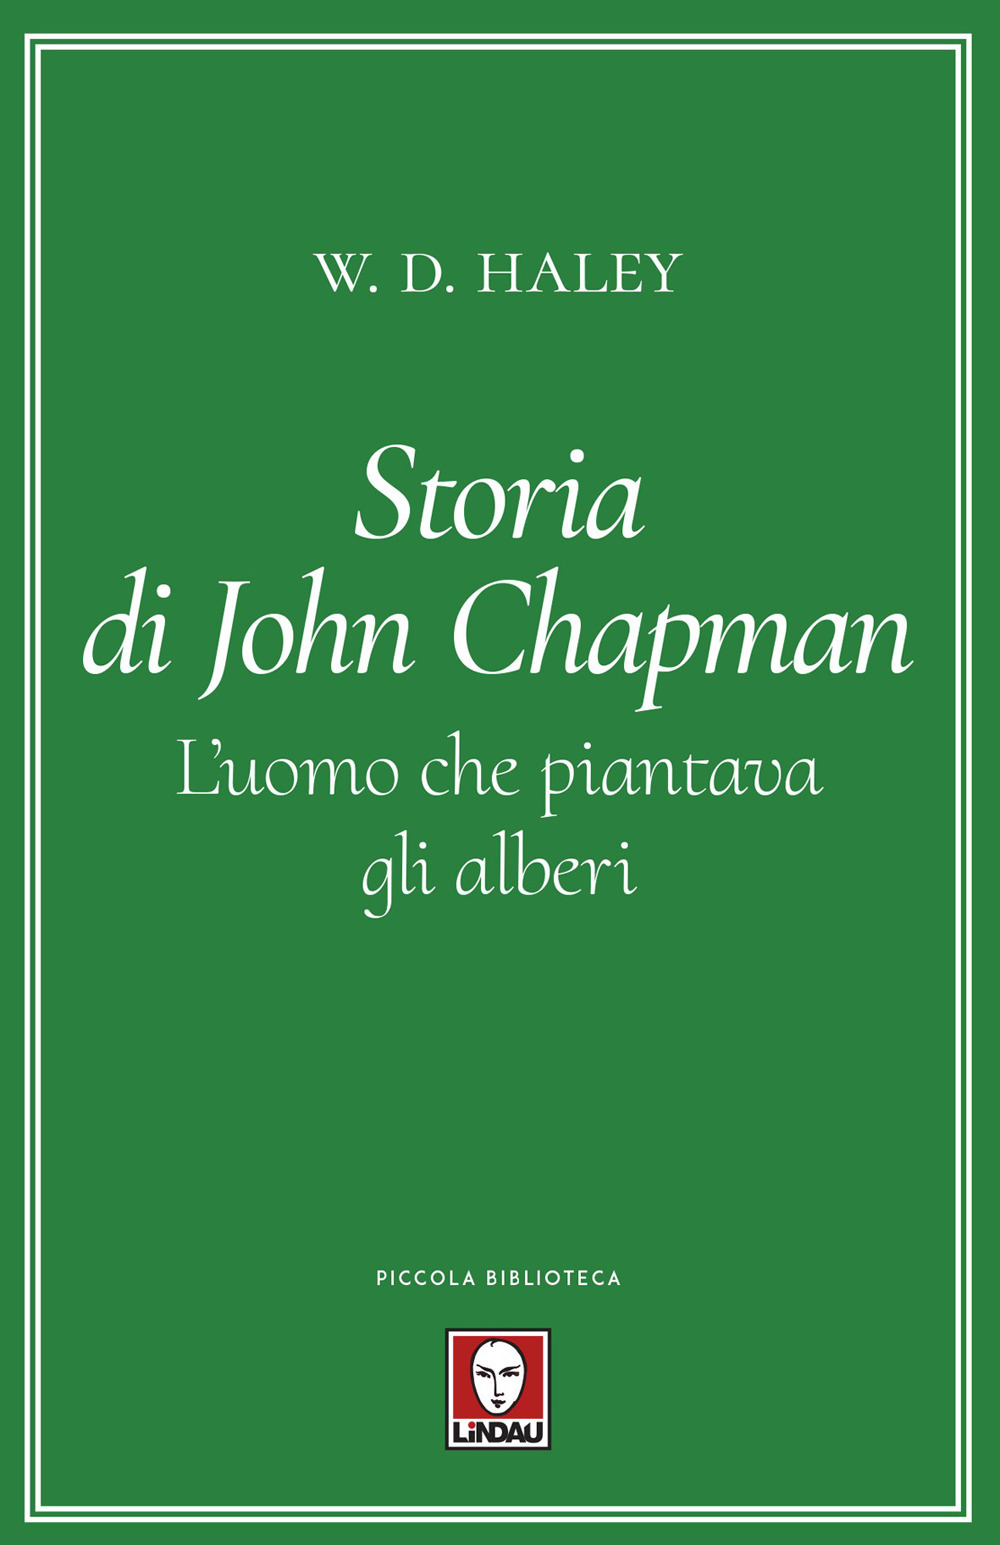 STORIA DI JOHN CHAPMAN - 9788833533933